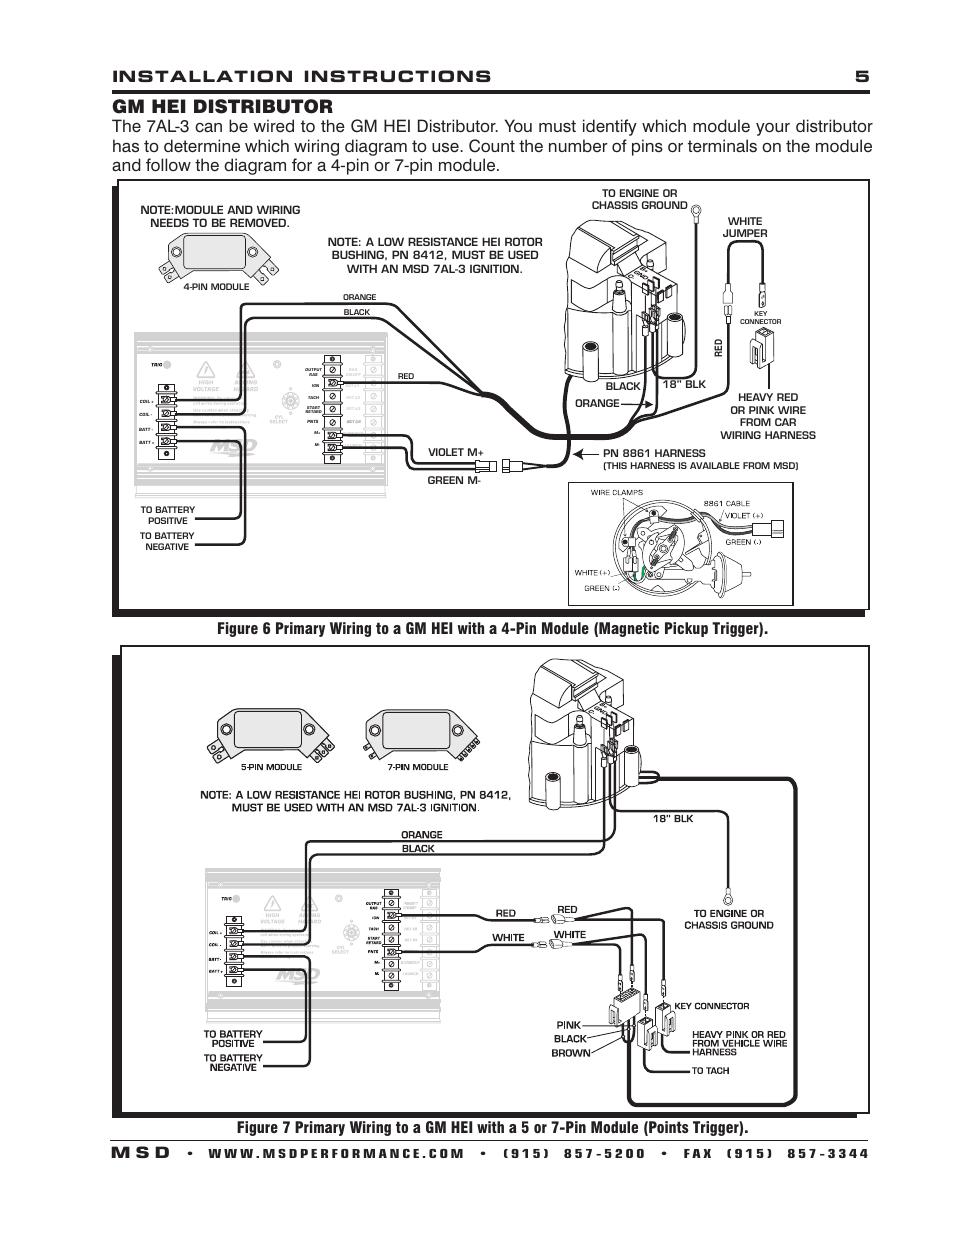 msd 7330 7al 3 ignition control installation page5?resize=665%2C861 msd 7al3 wiring diagram msd 7al 2 information, msd box wiring msd 7al 2 wiring diagram at eliteediting.co